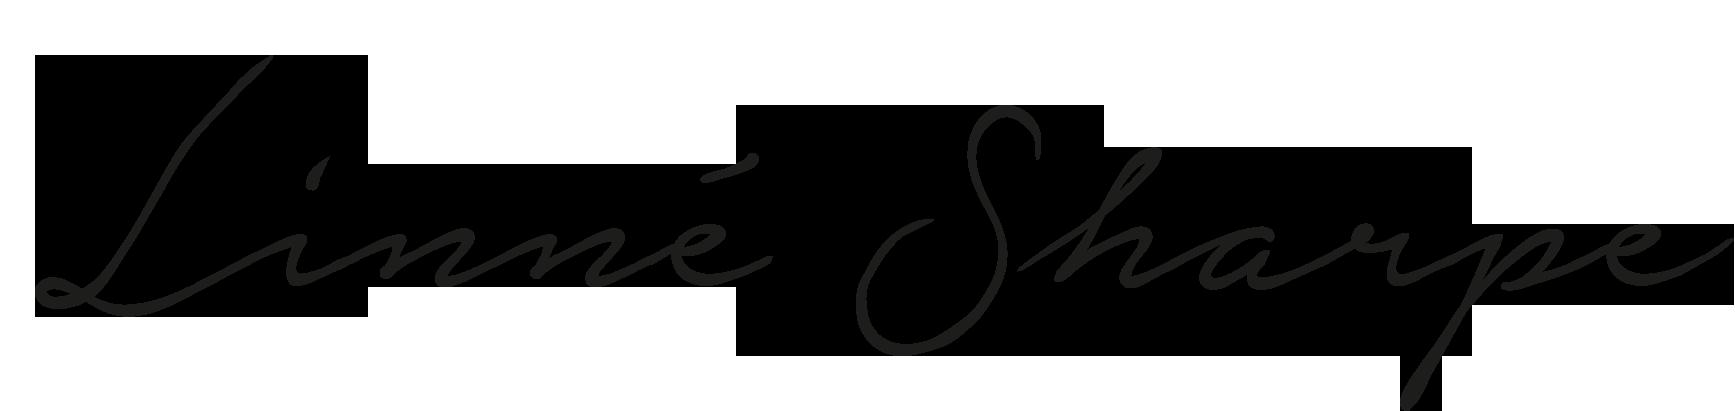 Linné Sharpe